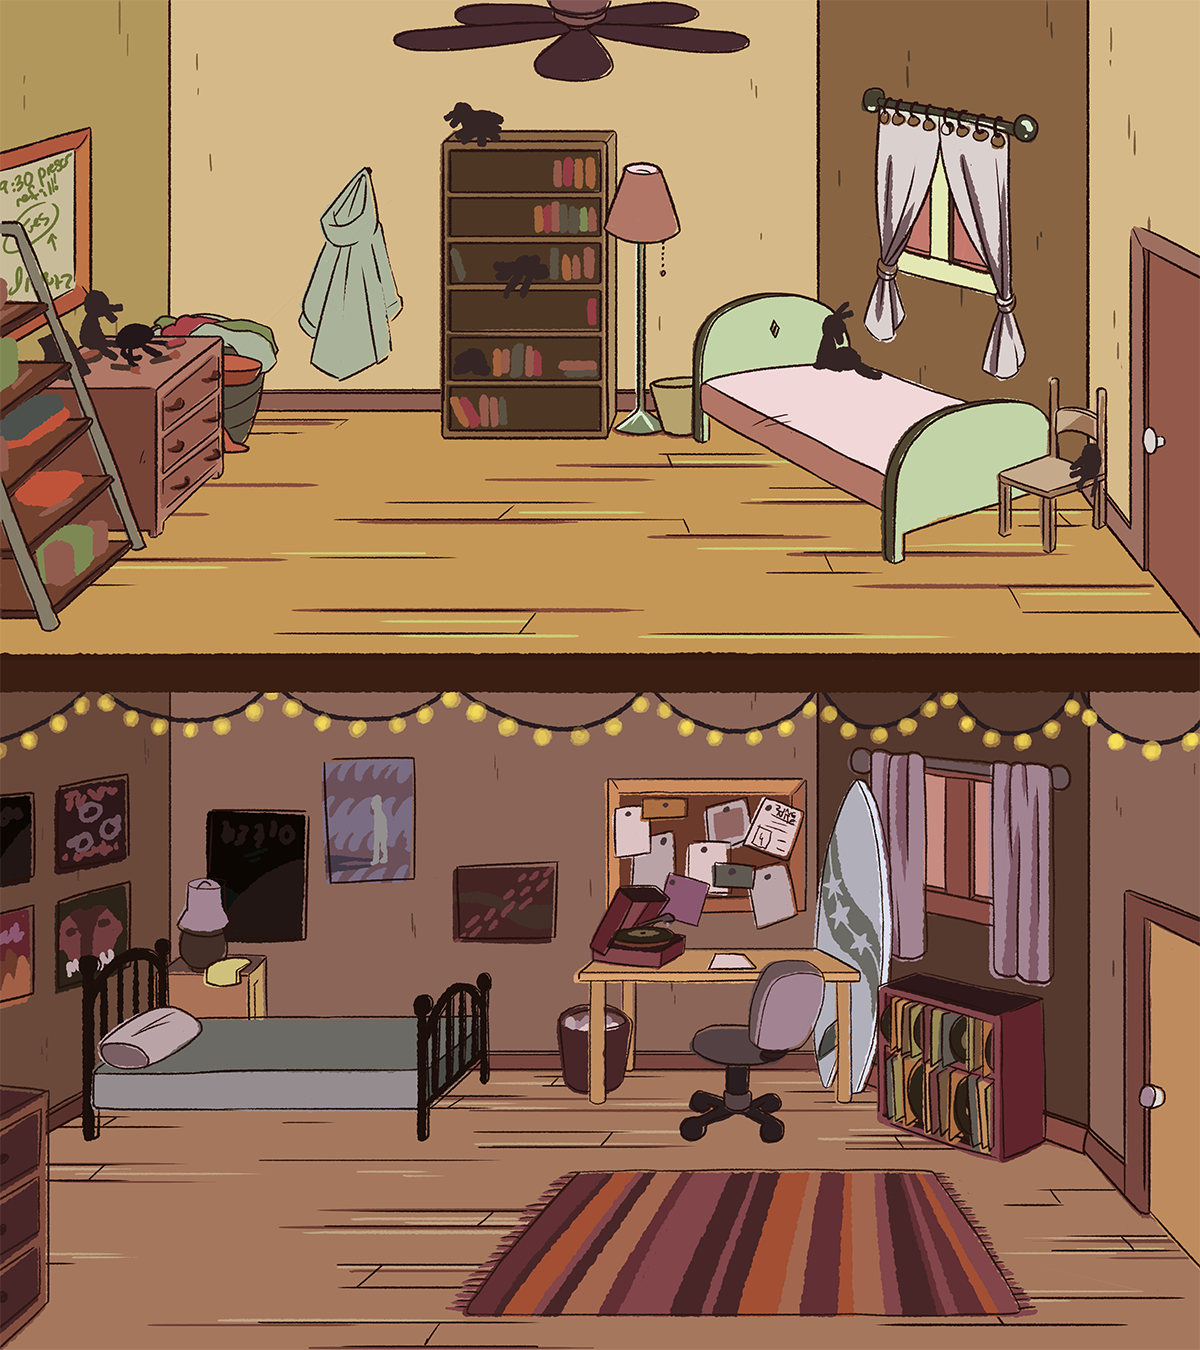 apartmentpan_final_dusk_LQ.png